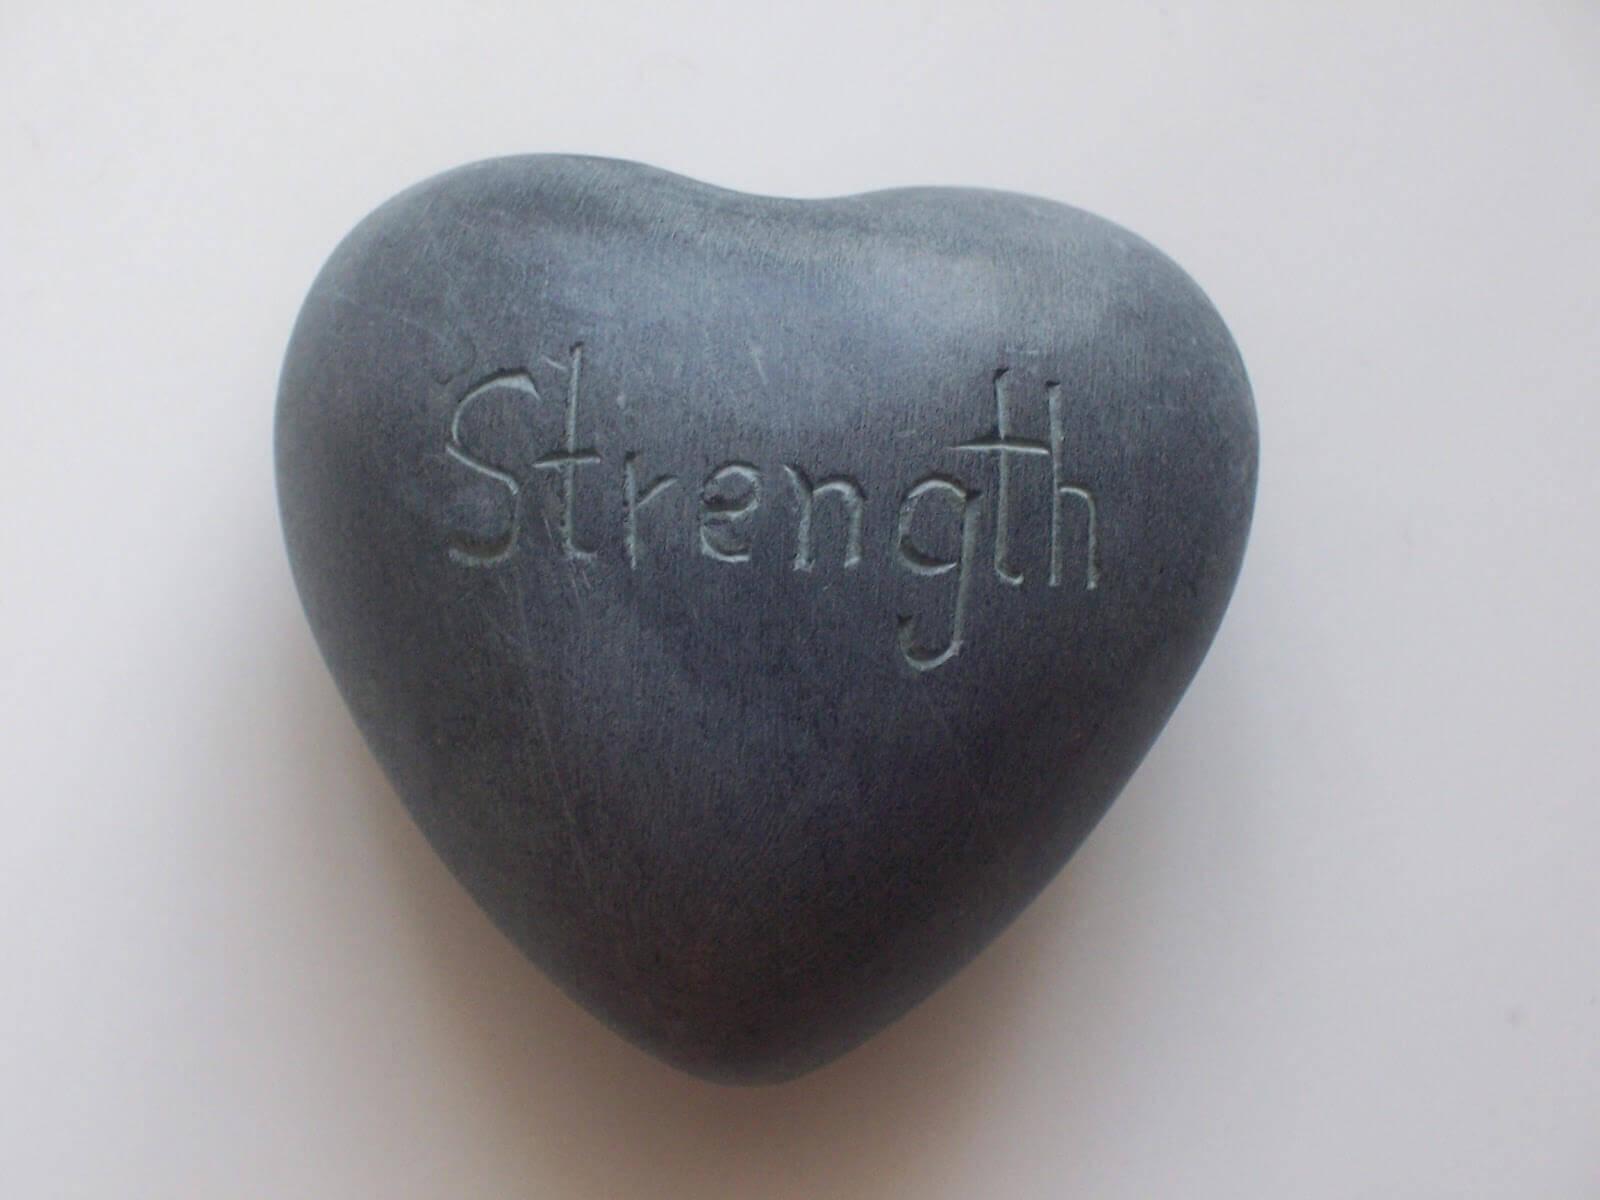 strength-007